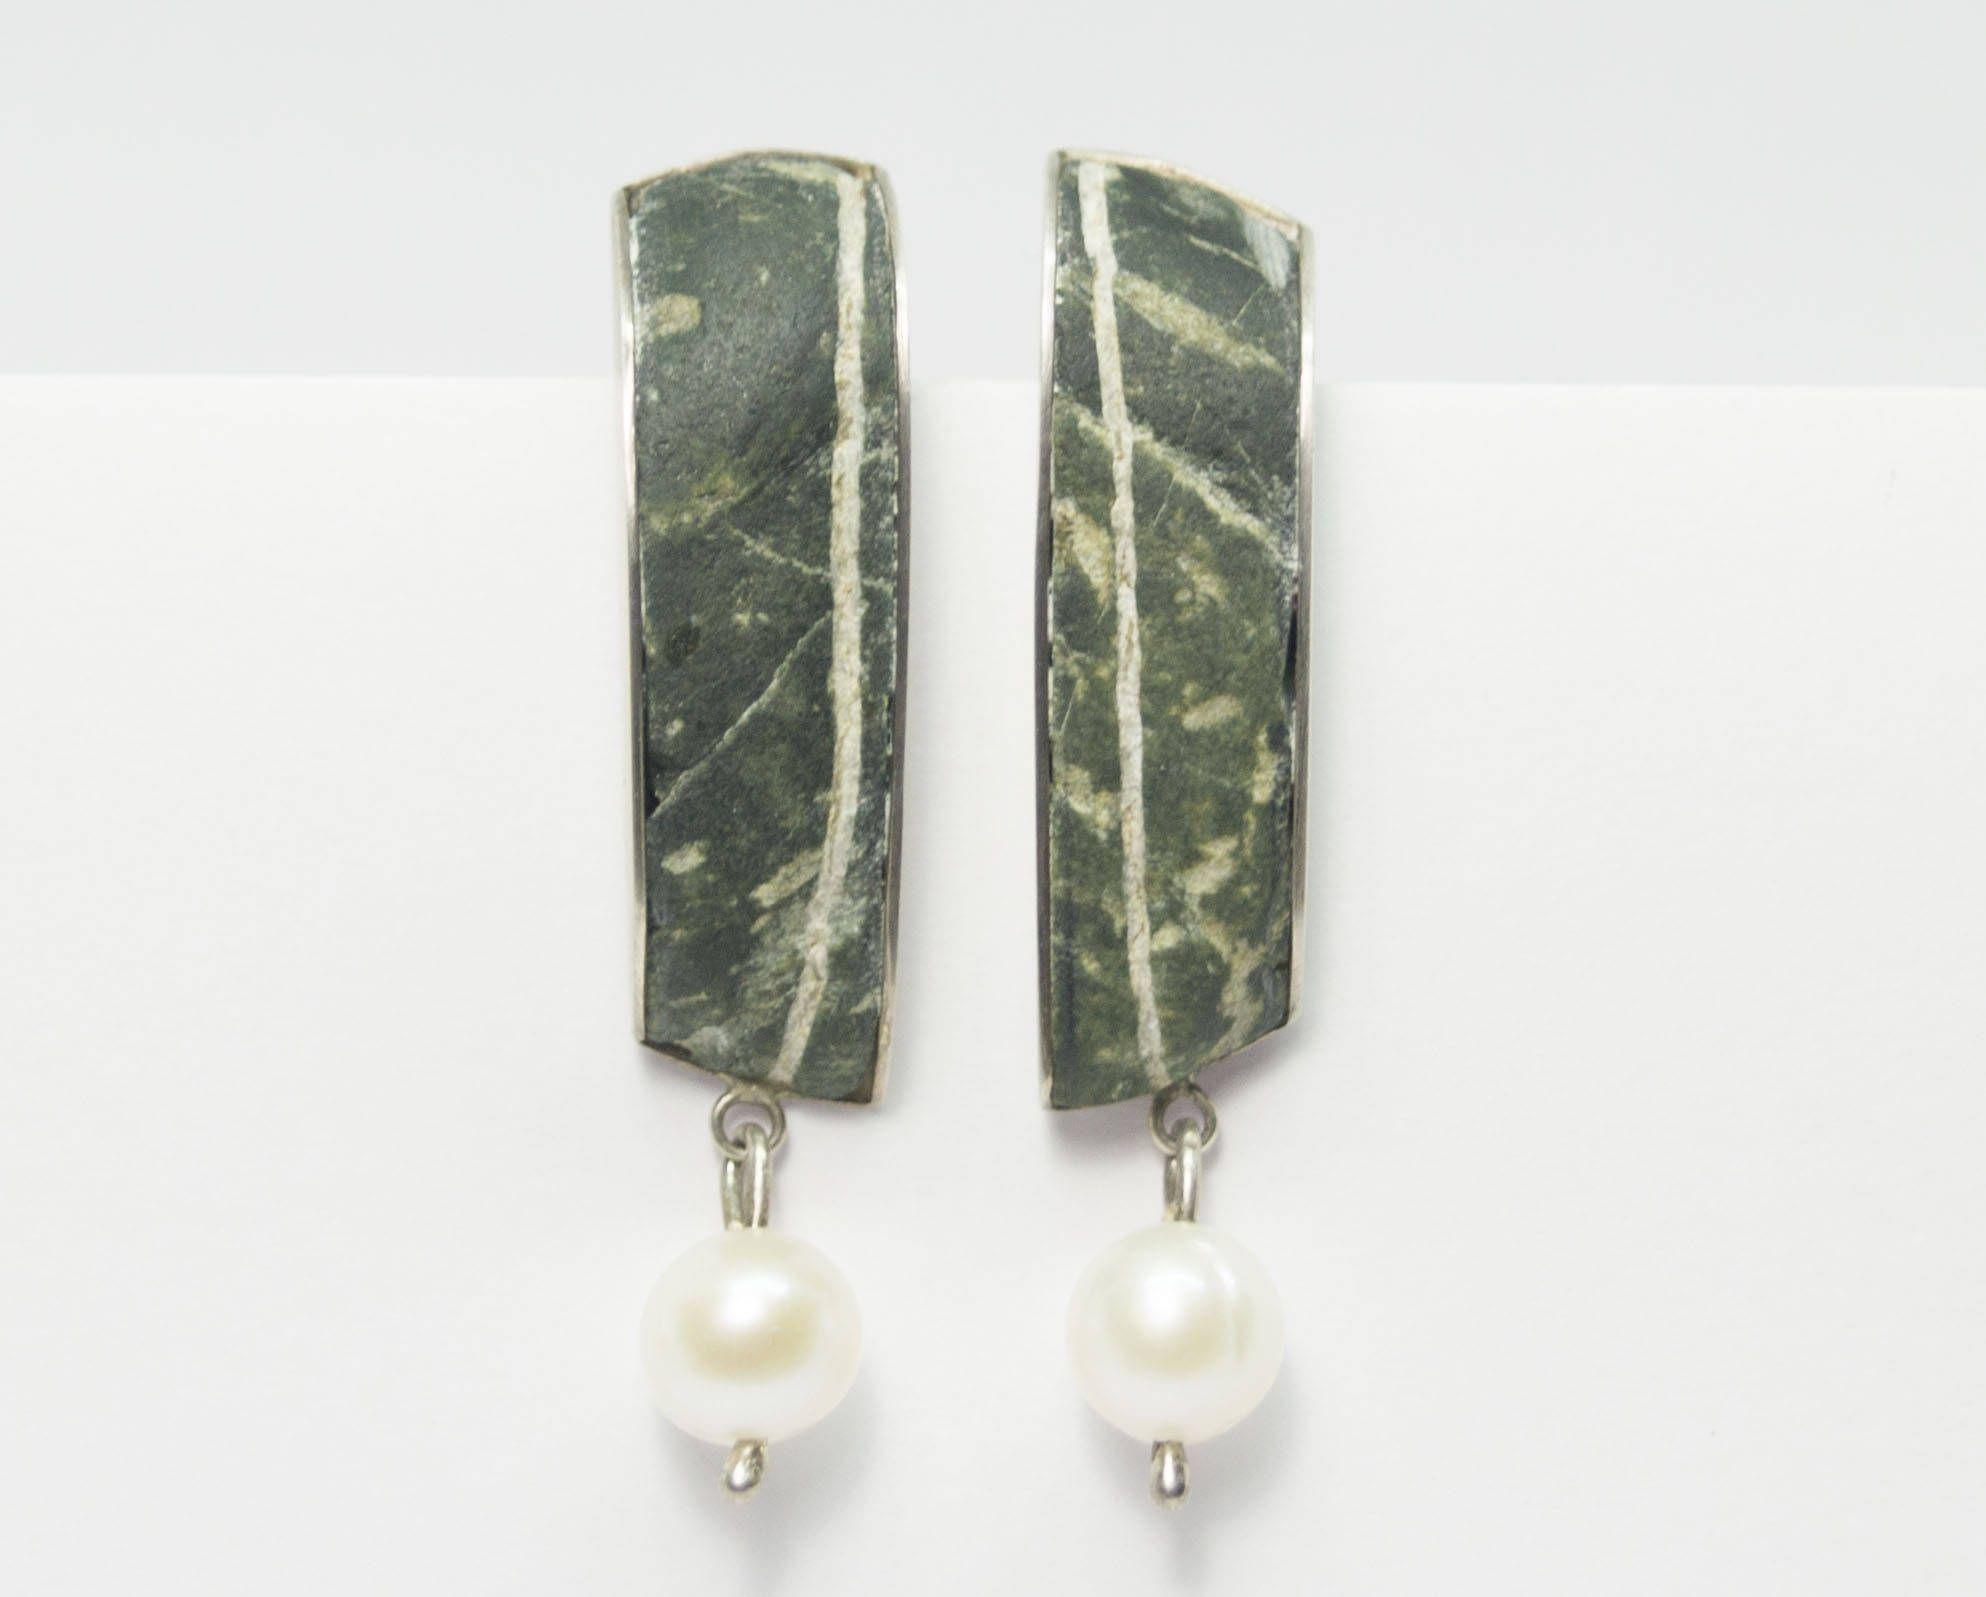 Silberohrringe mit Perle, Perlenohrringe, Ohrring mit Rohstein ...